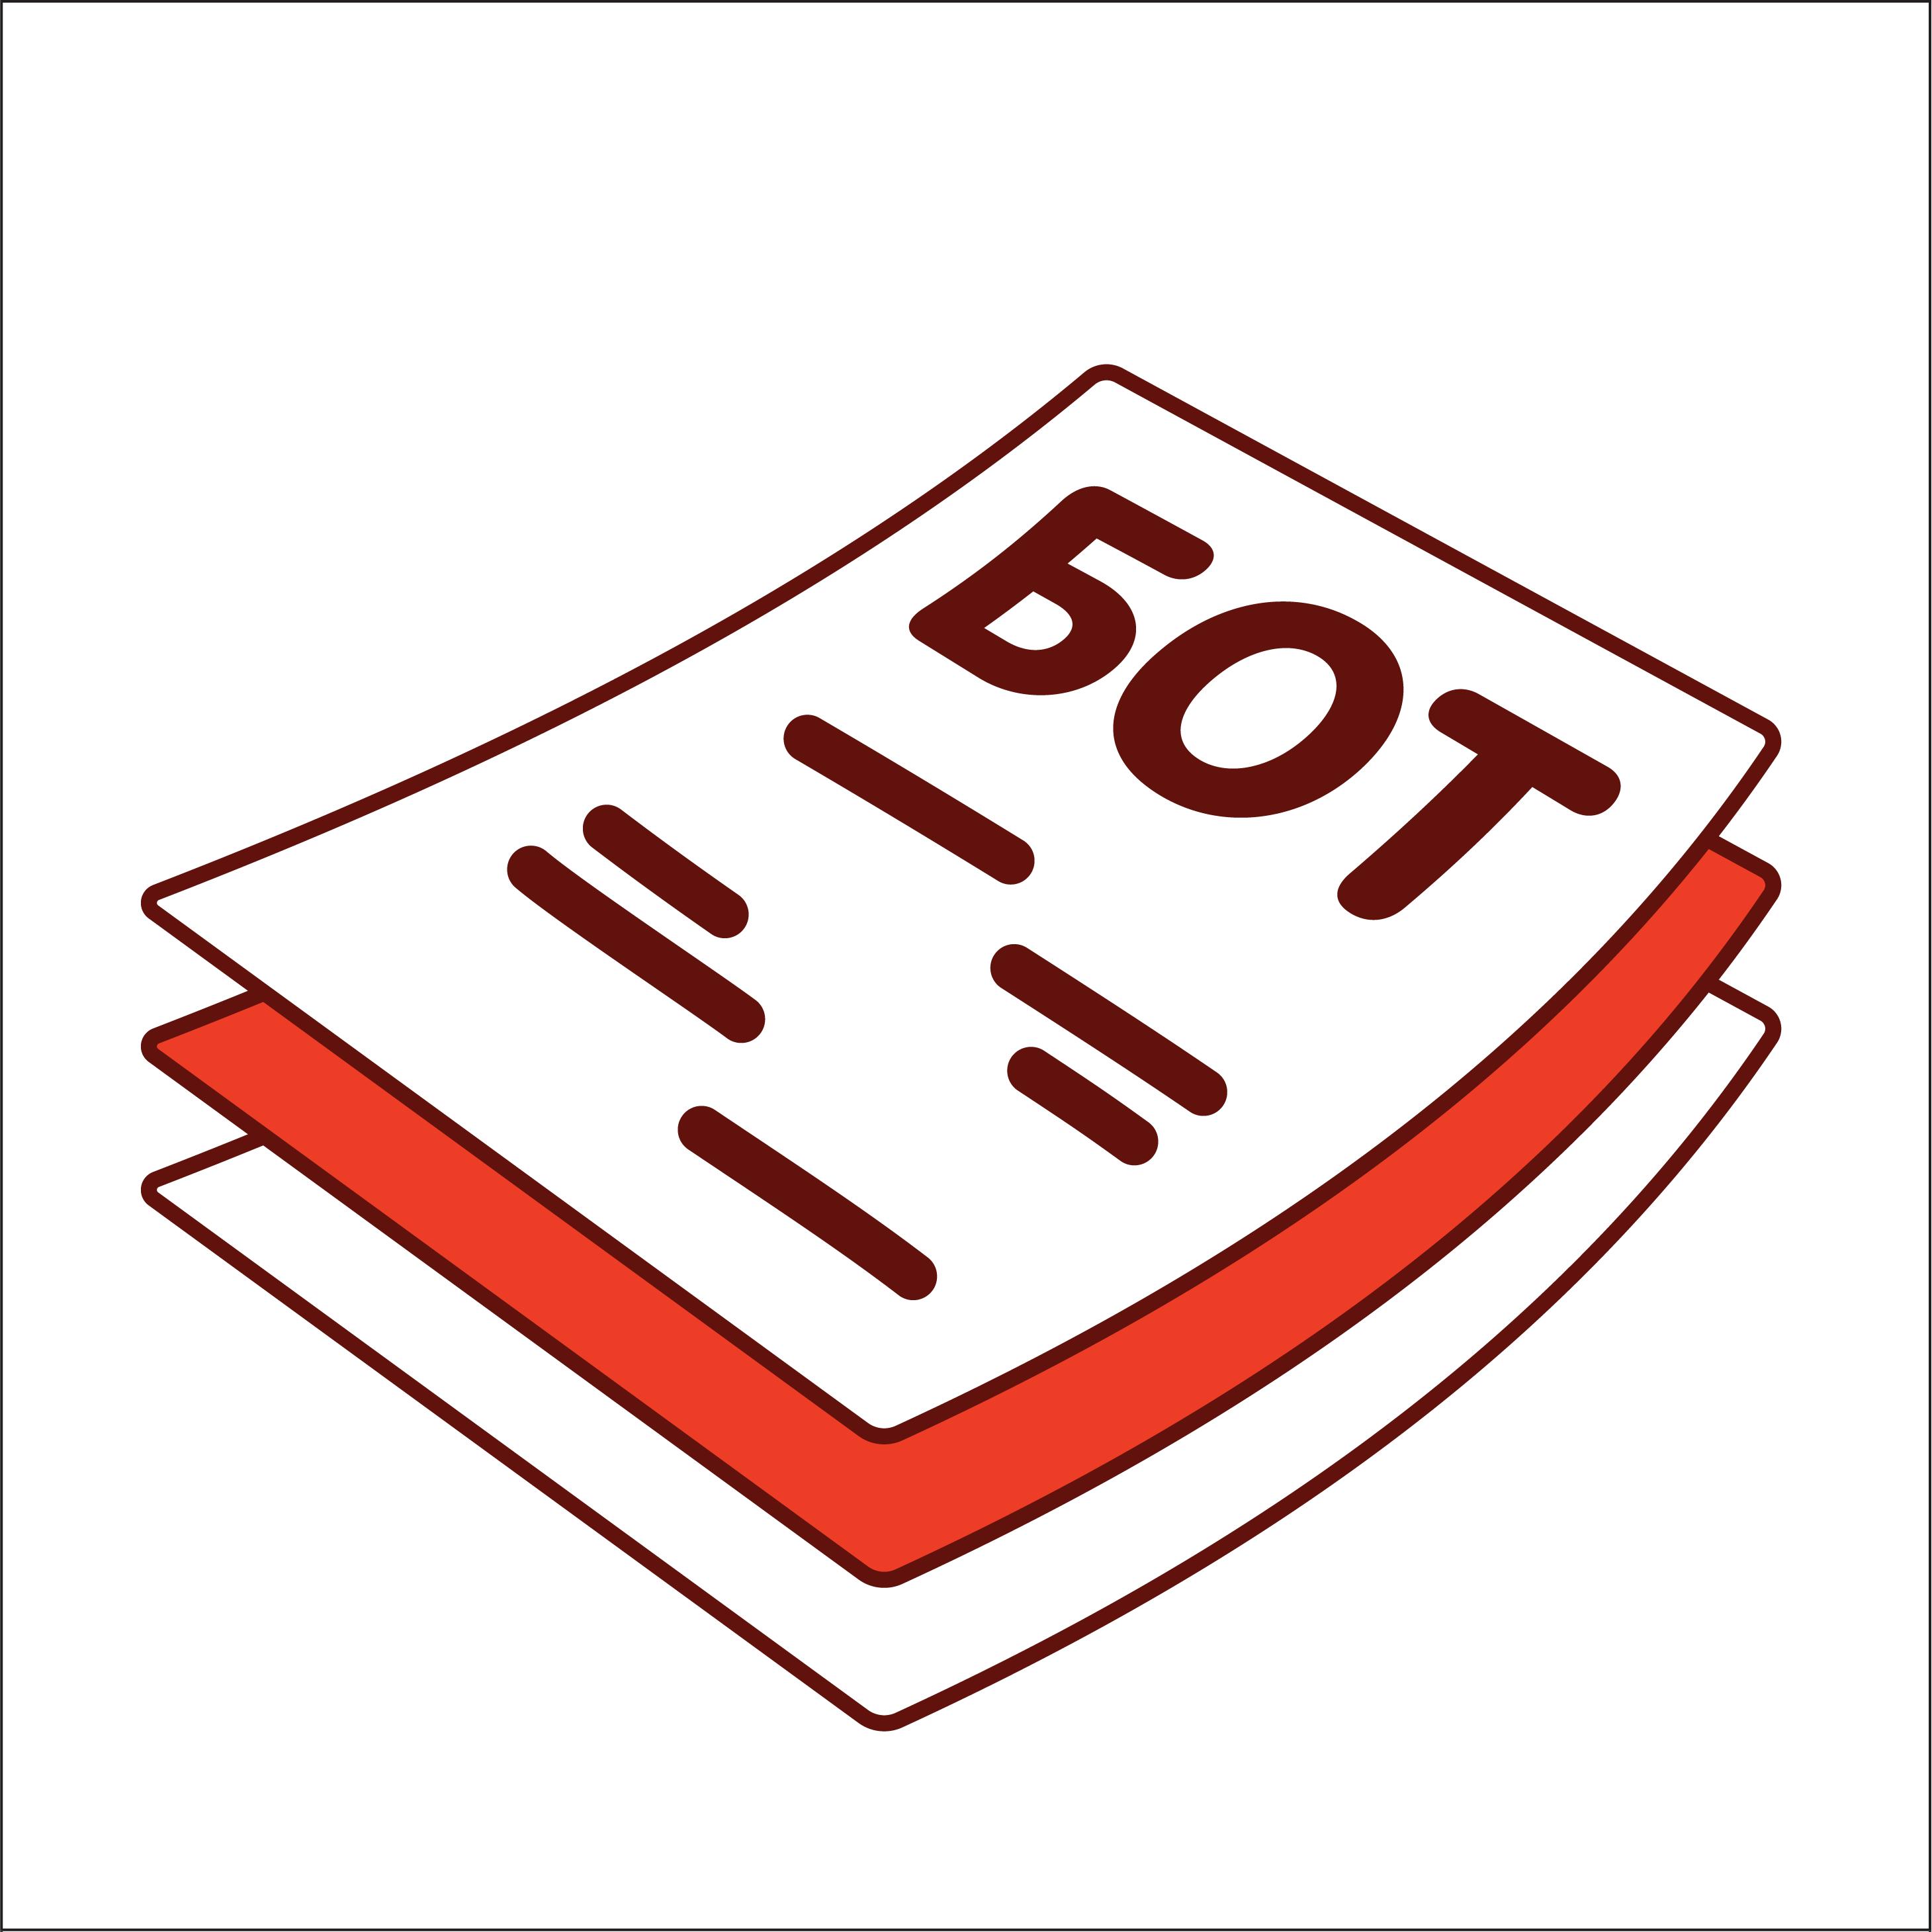 unusual/listovki97-avatar/img/listovki97-avatar-bot.png